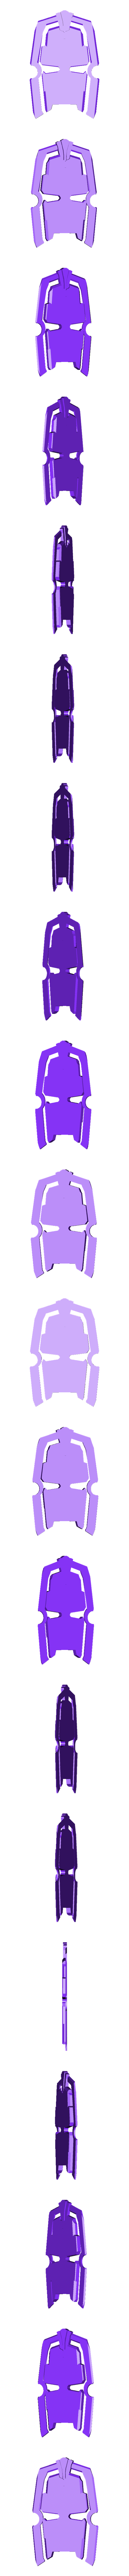 MiddleBodyPart.stl Download free STL file Power Rangers Megaforce Gosei morpher • 3D printable design, EliGreen